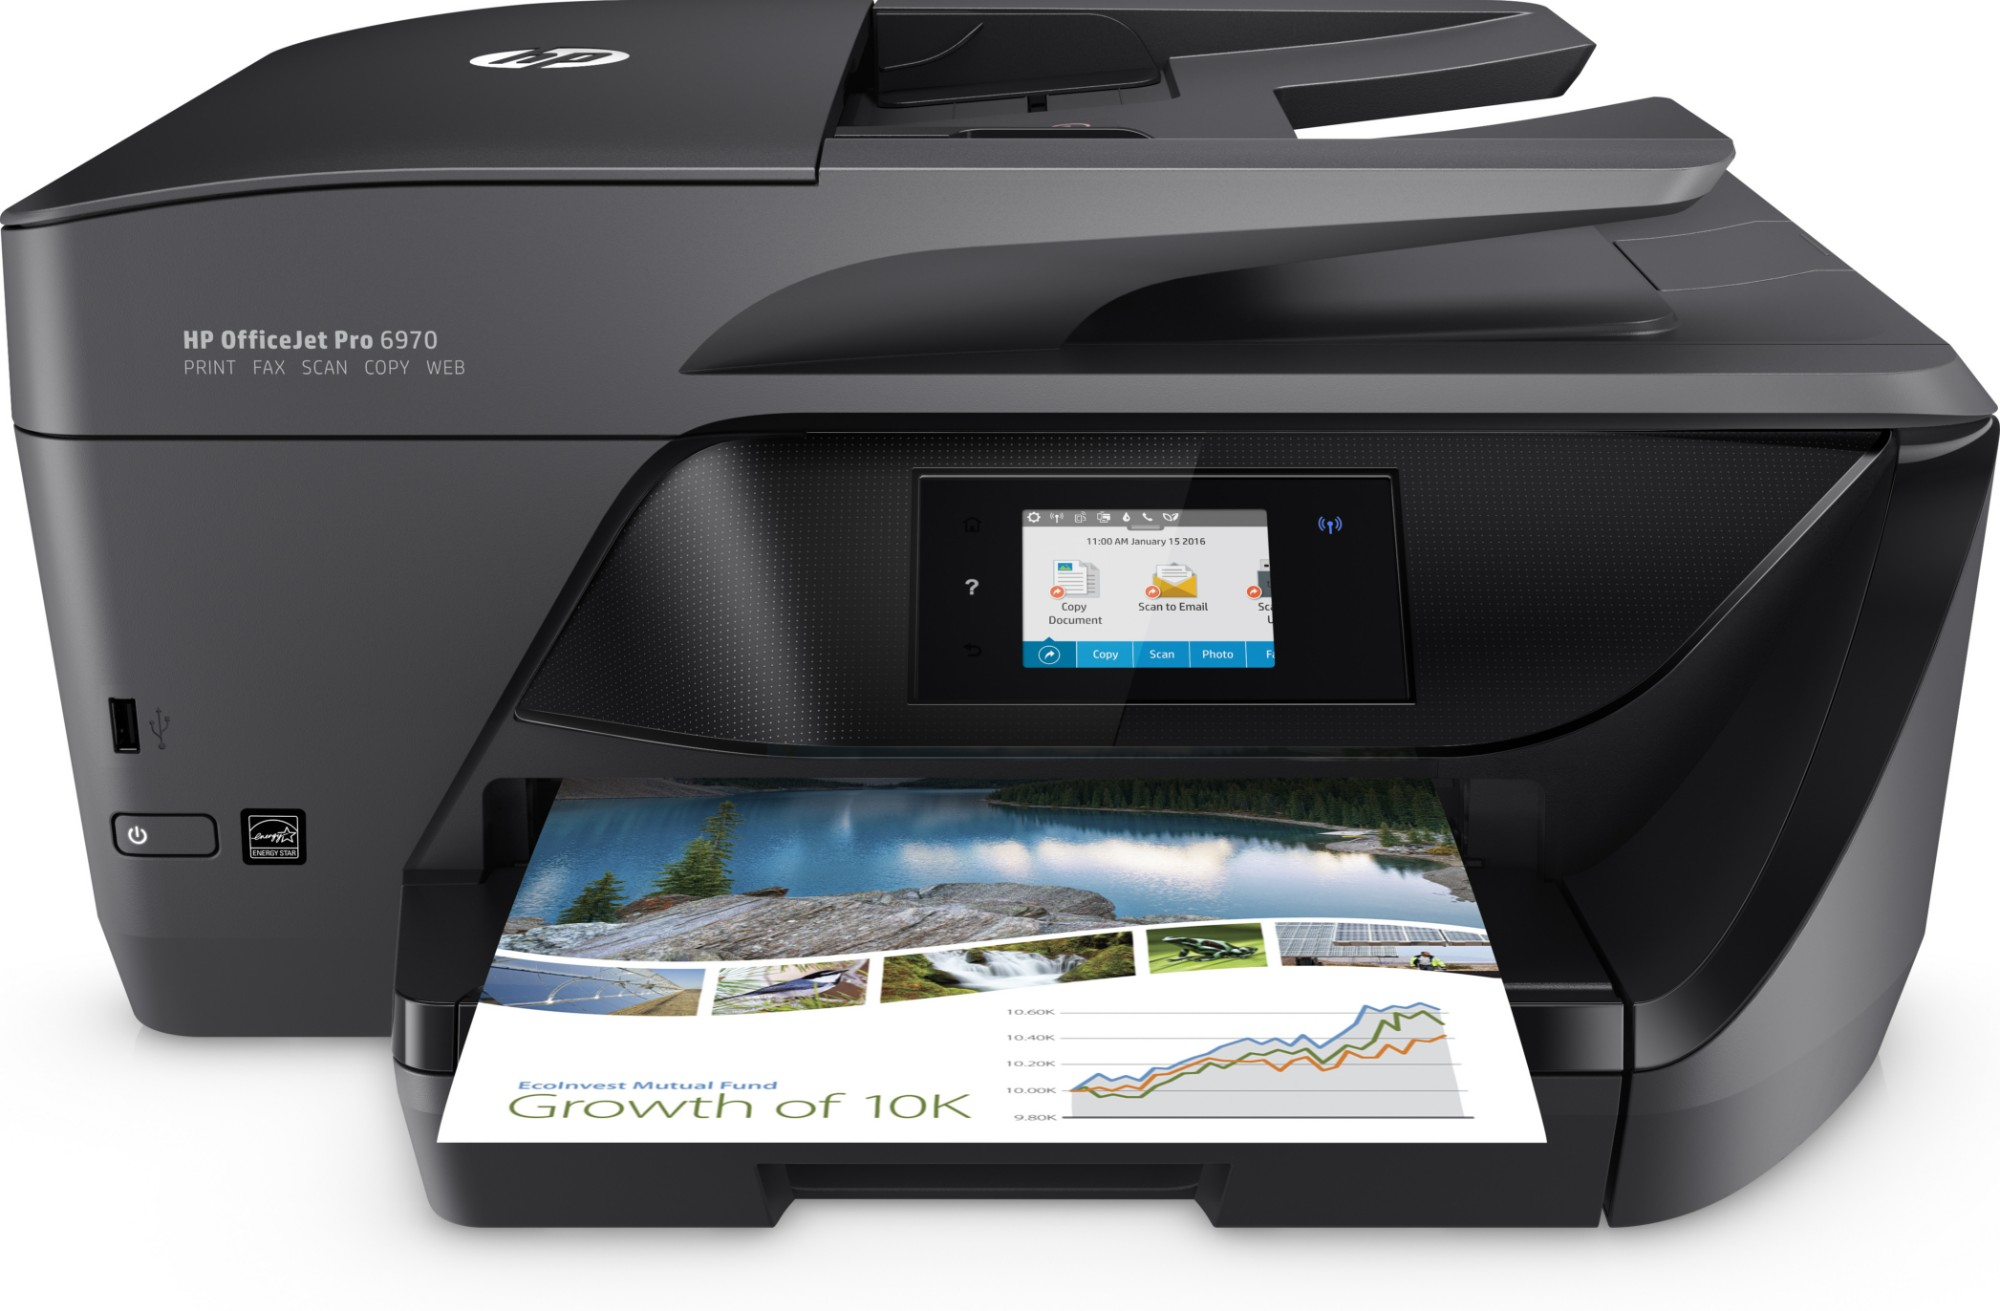 HP OfficeJet Pro 6970 600 x 1200DPI Thermal Inkjet A4 20ppm Wi-Fi